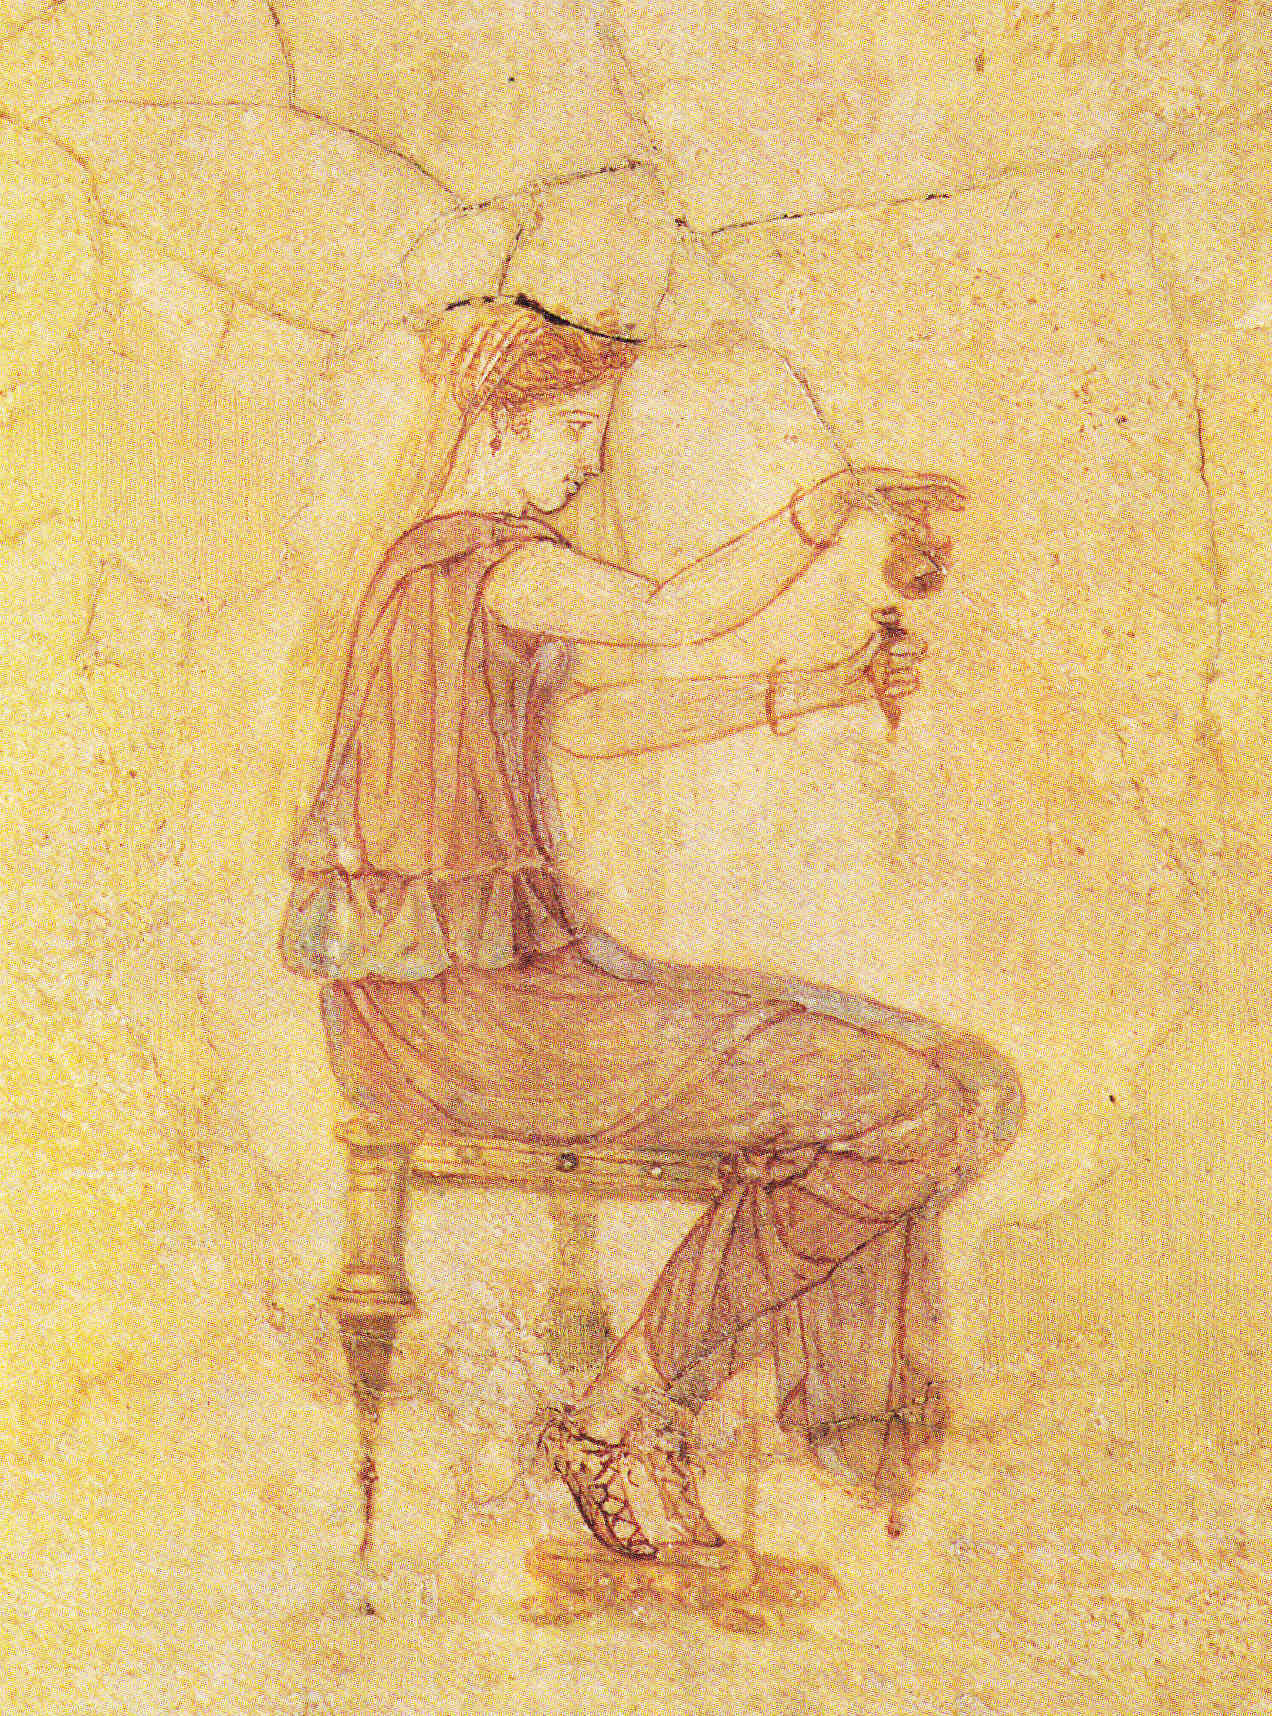 Egipto Antiguo 172 Aprendizaje de Cleopatra VII a domicilio